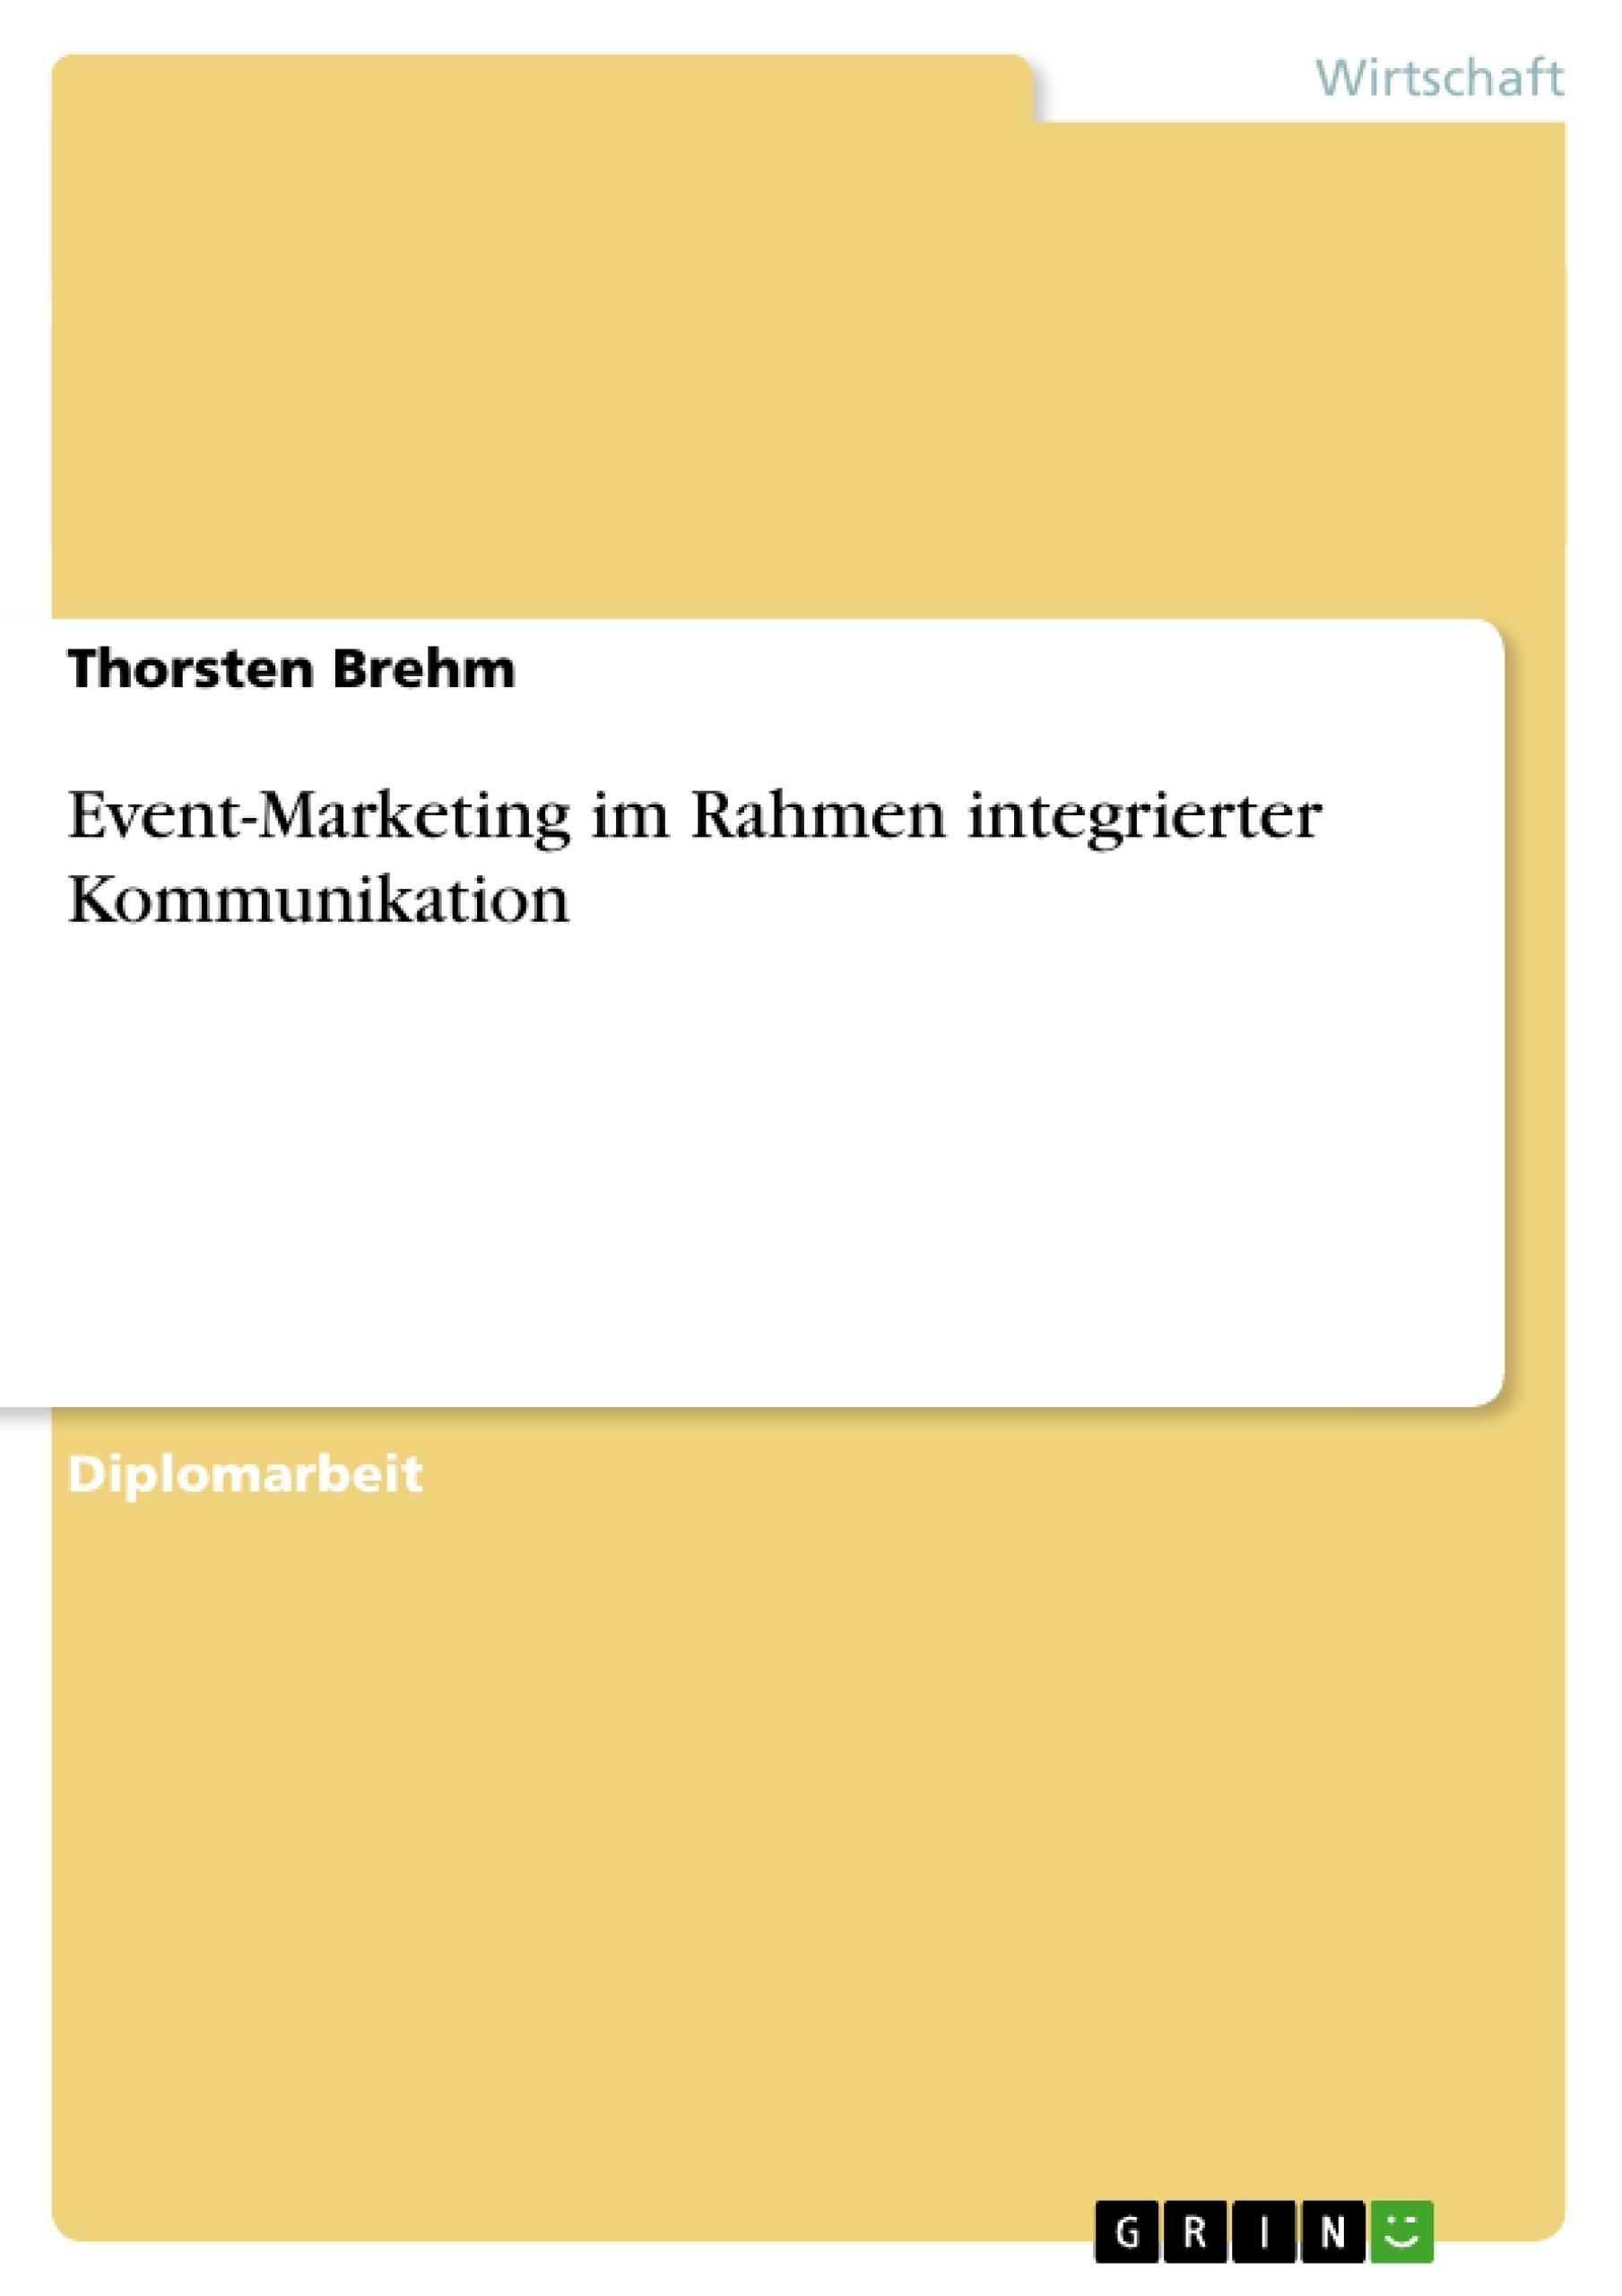 Titel: Event-Marketing im Rahmen integrierter Kommunikation